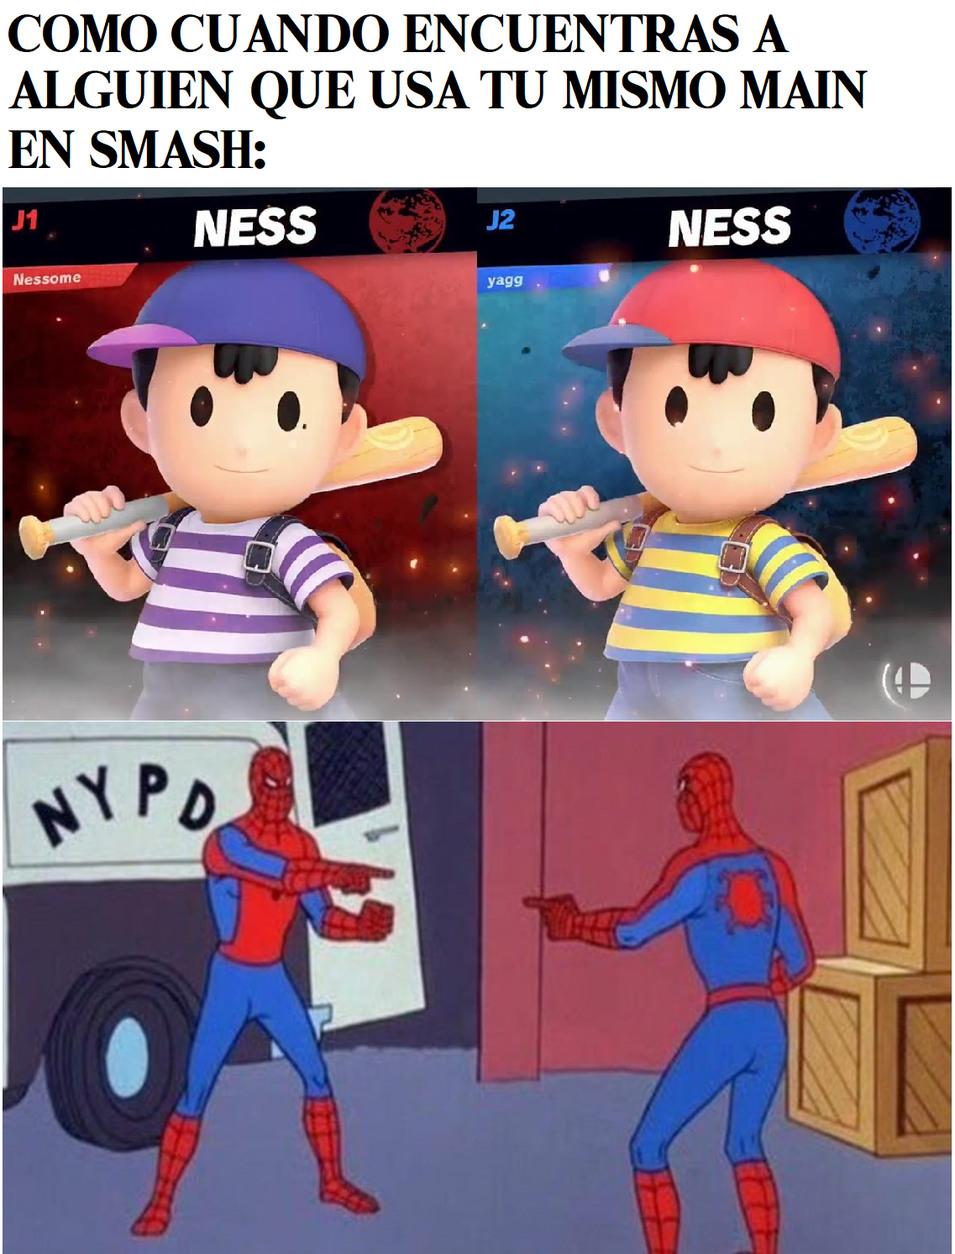 Mainmeneo - meme